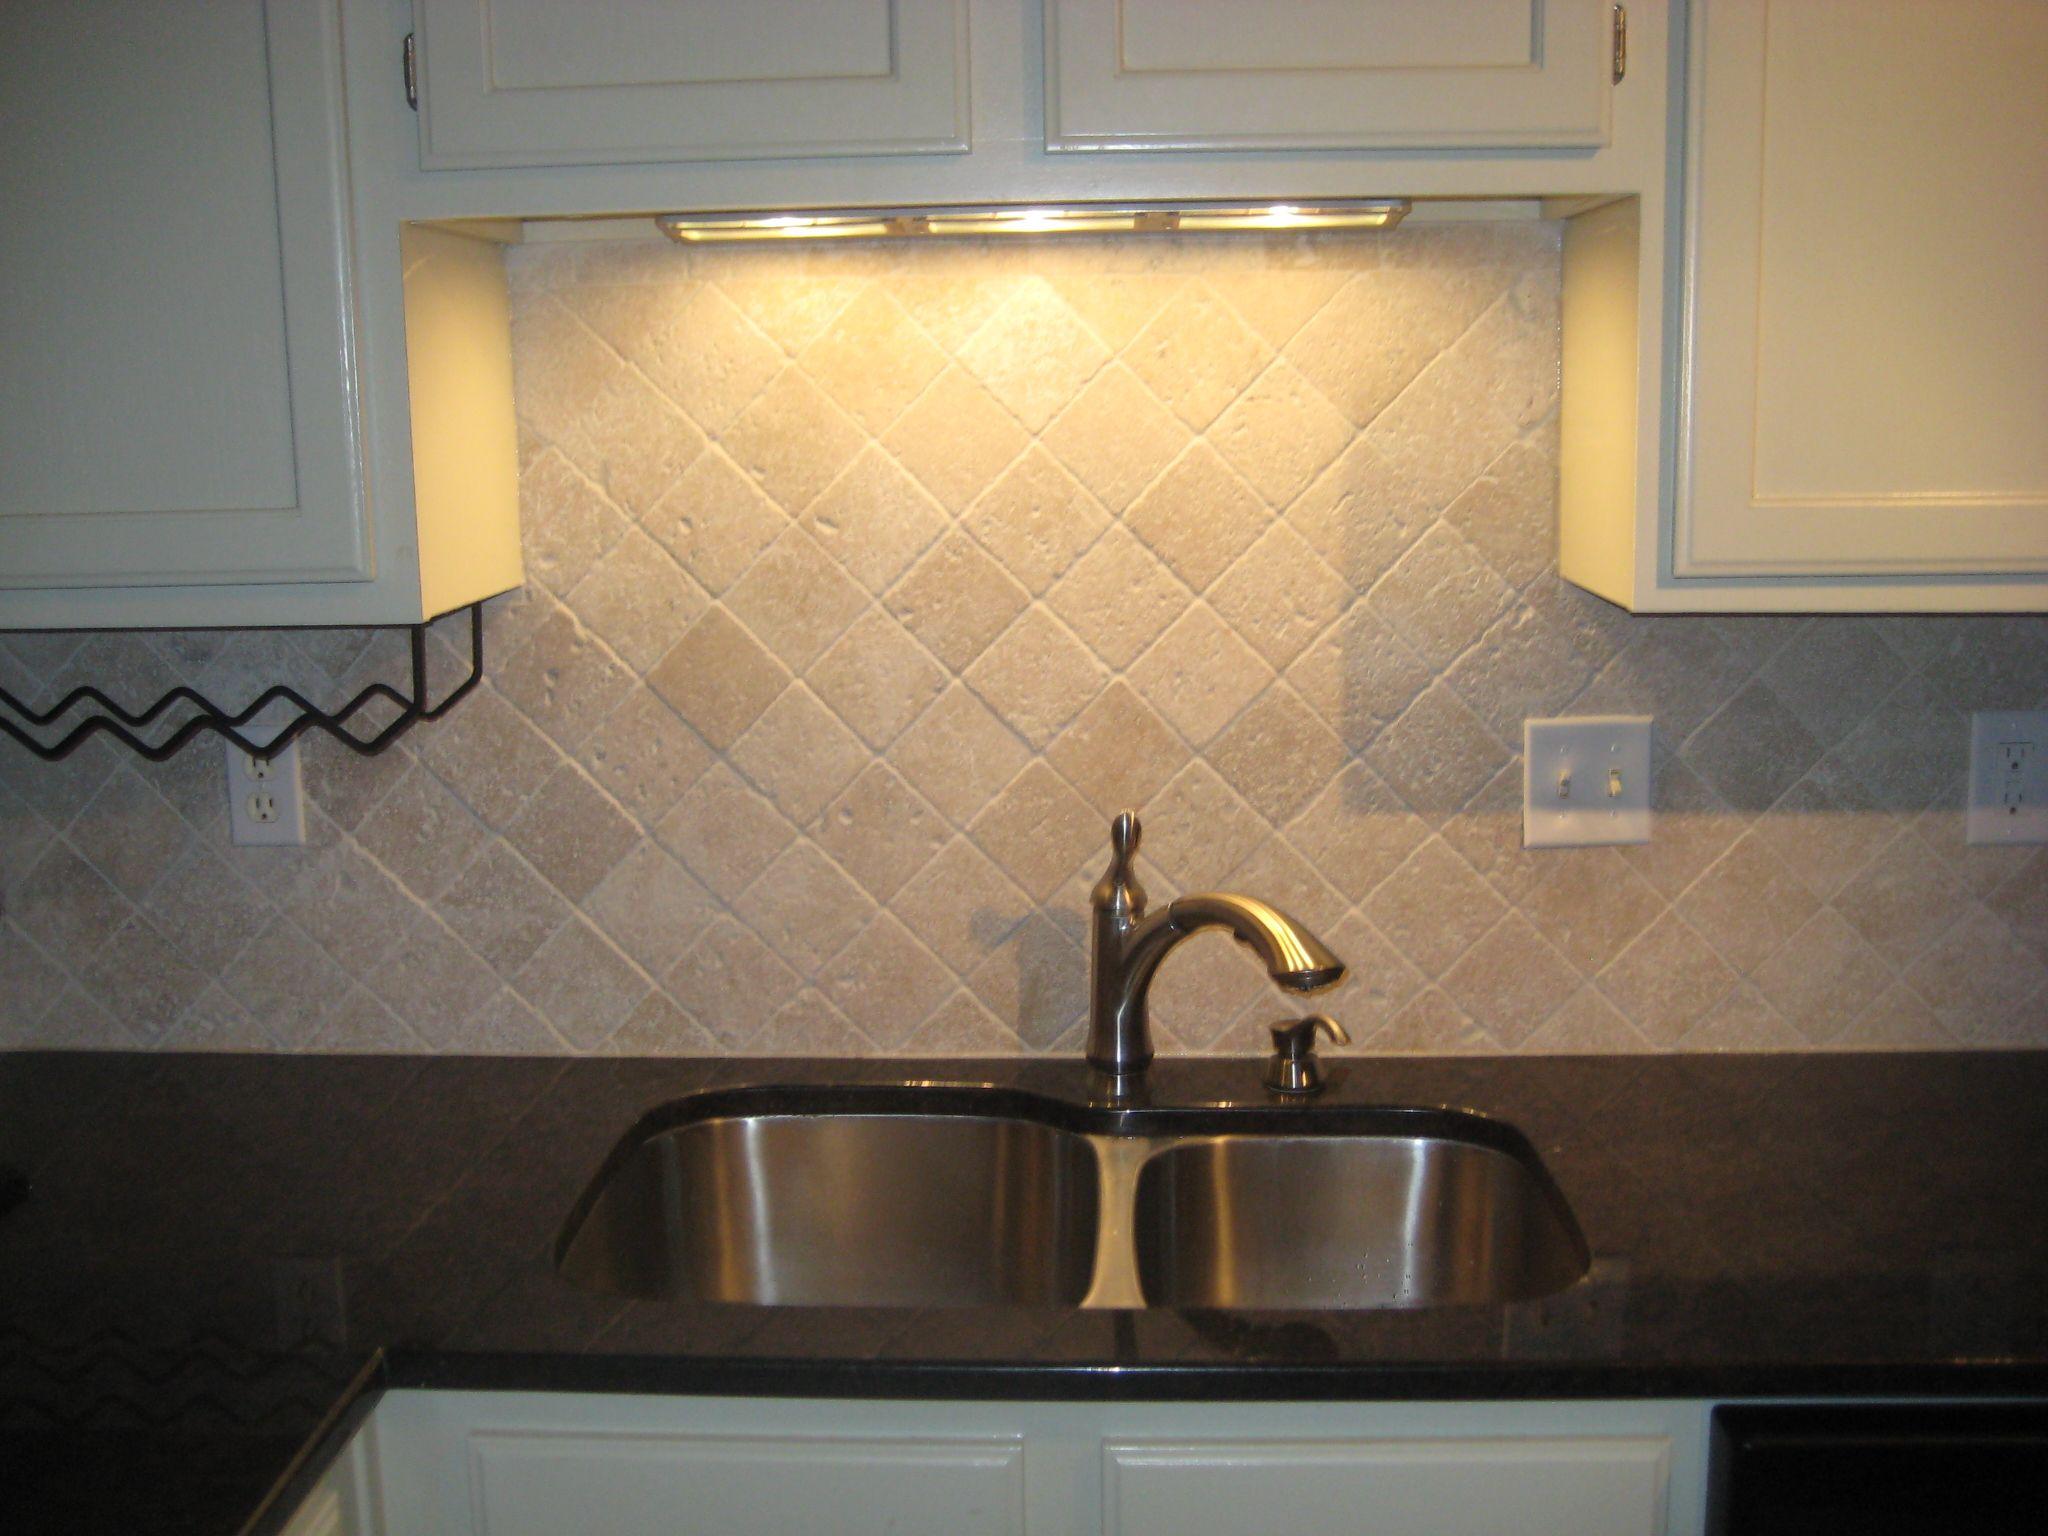 Villa kitchen s undermount stainless steel 60 40 split sink